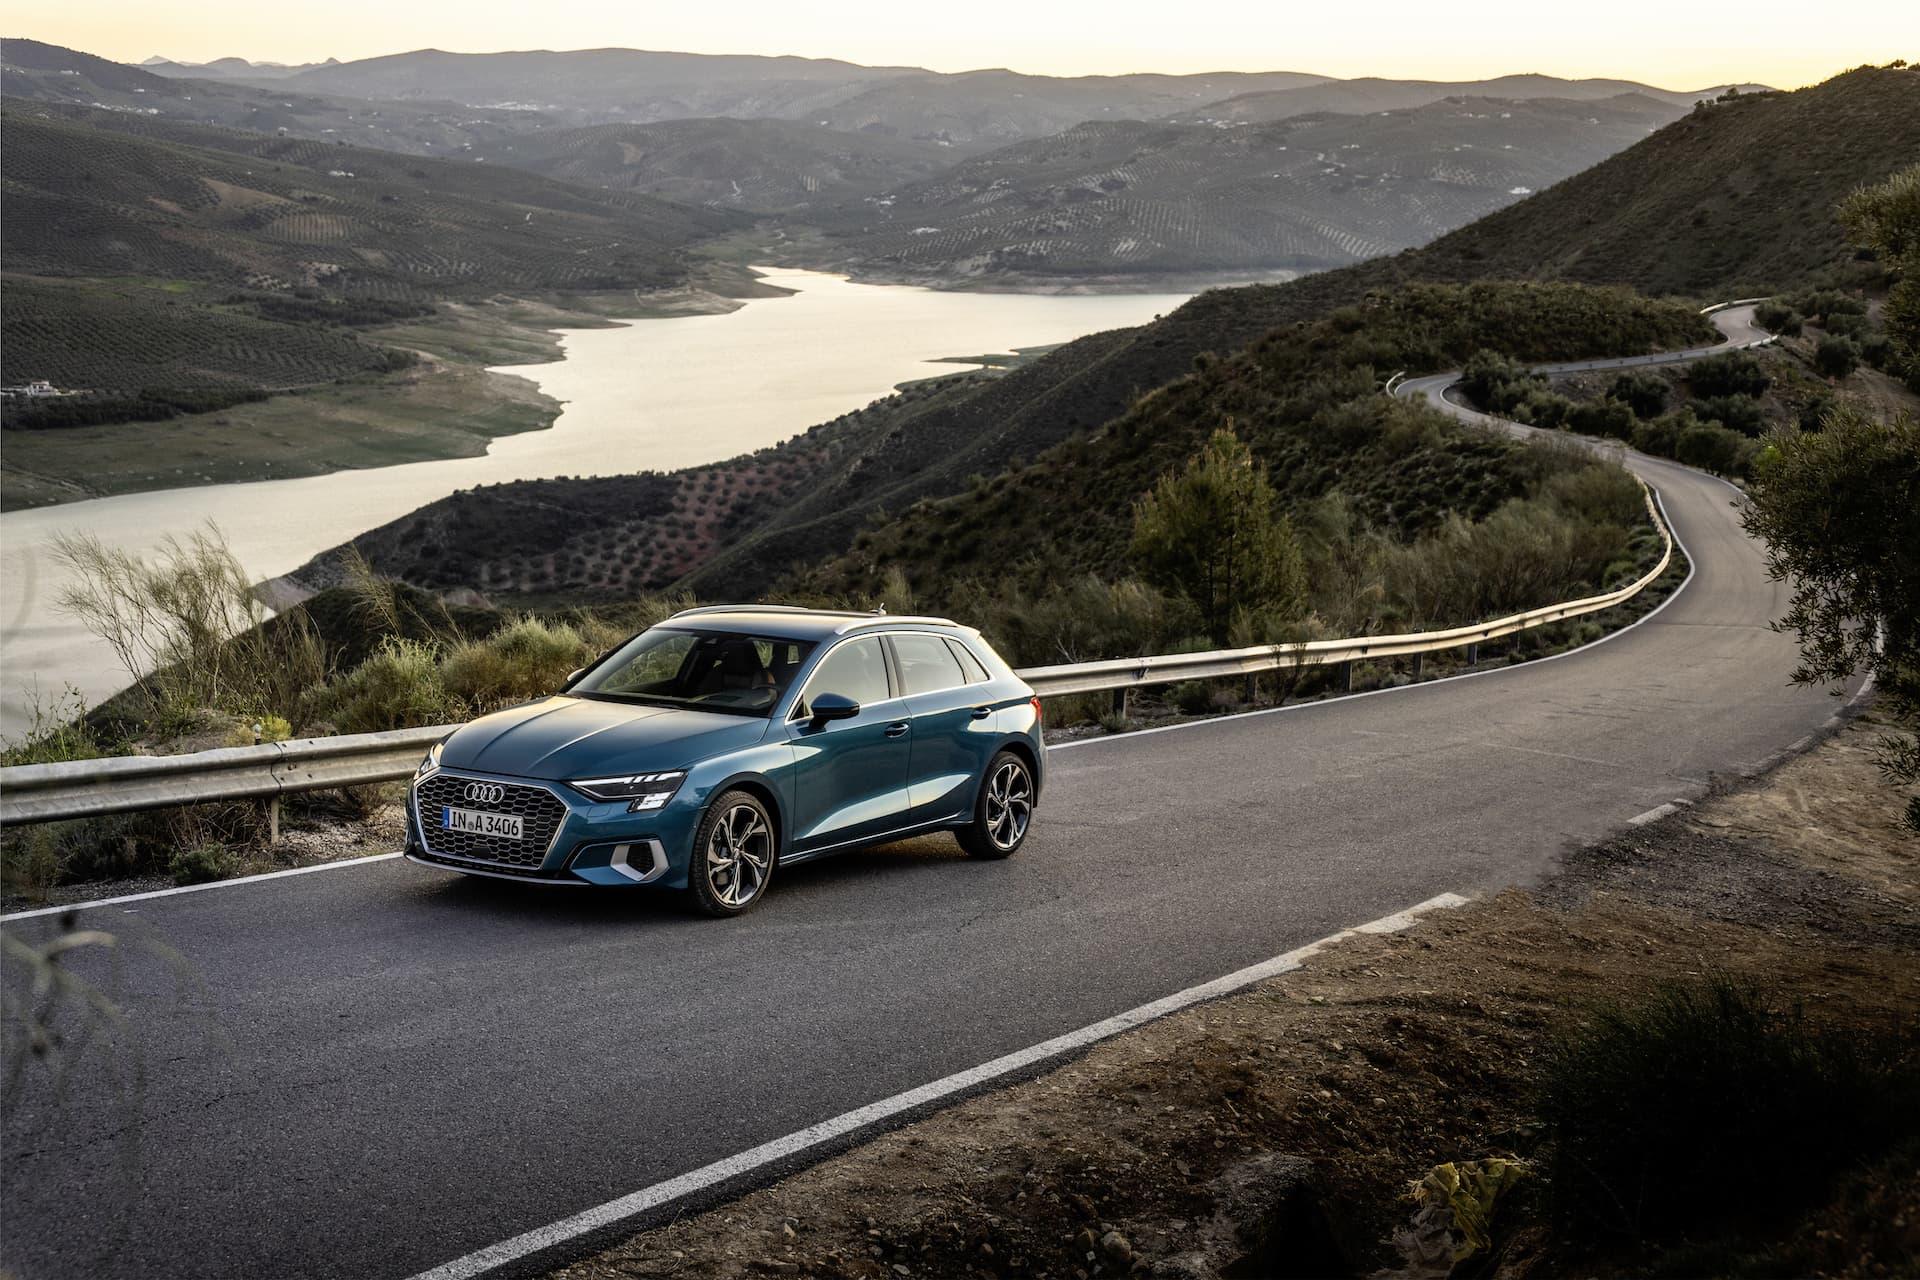 Audi A3 Sportback 2020 Azul Turbo Exterior 5